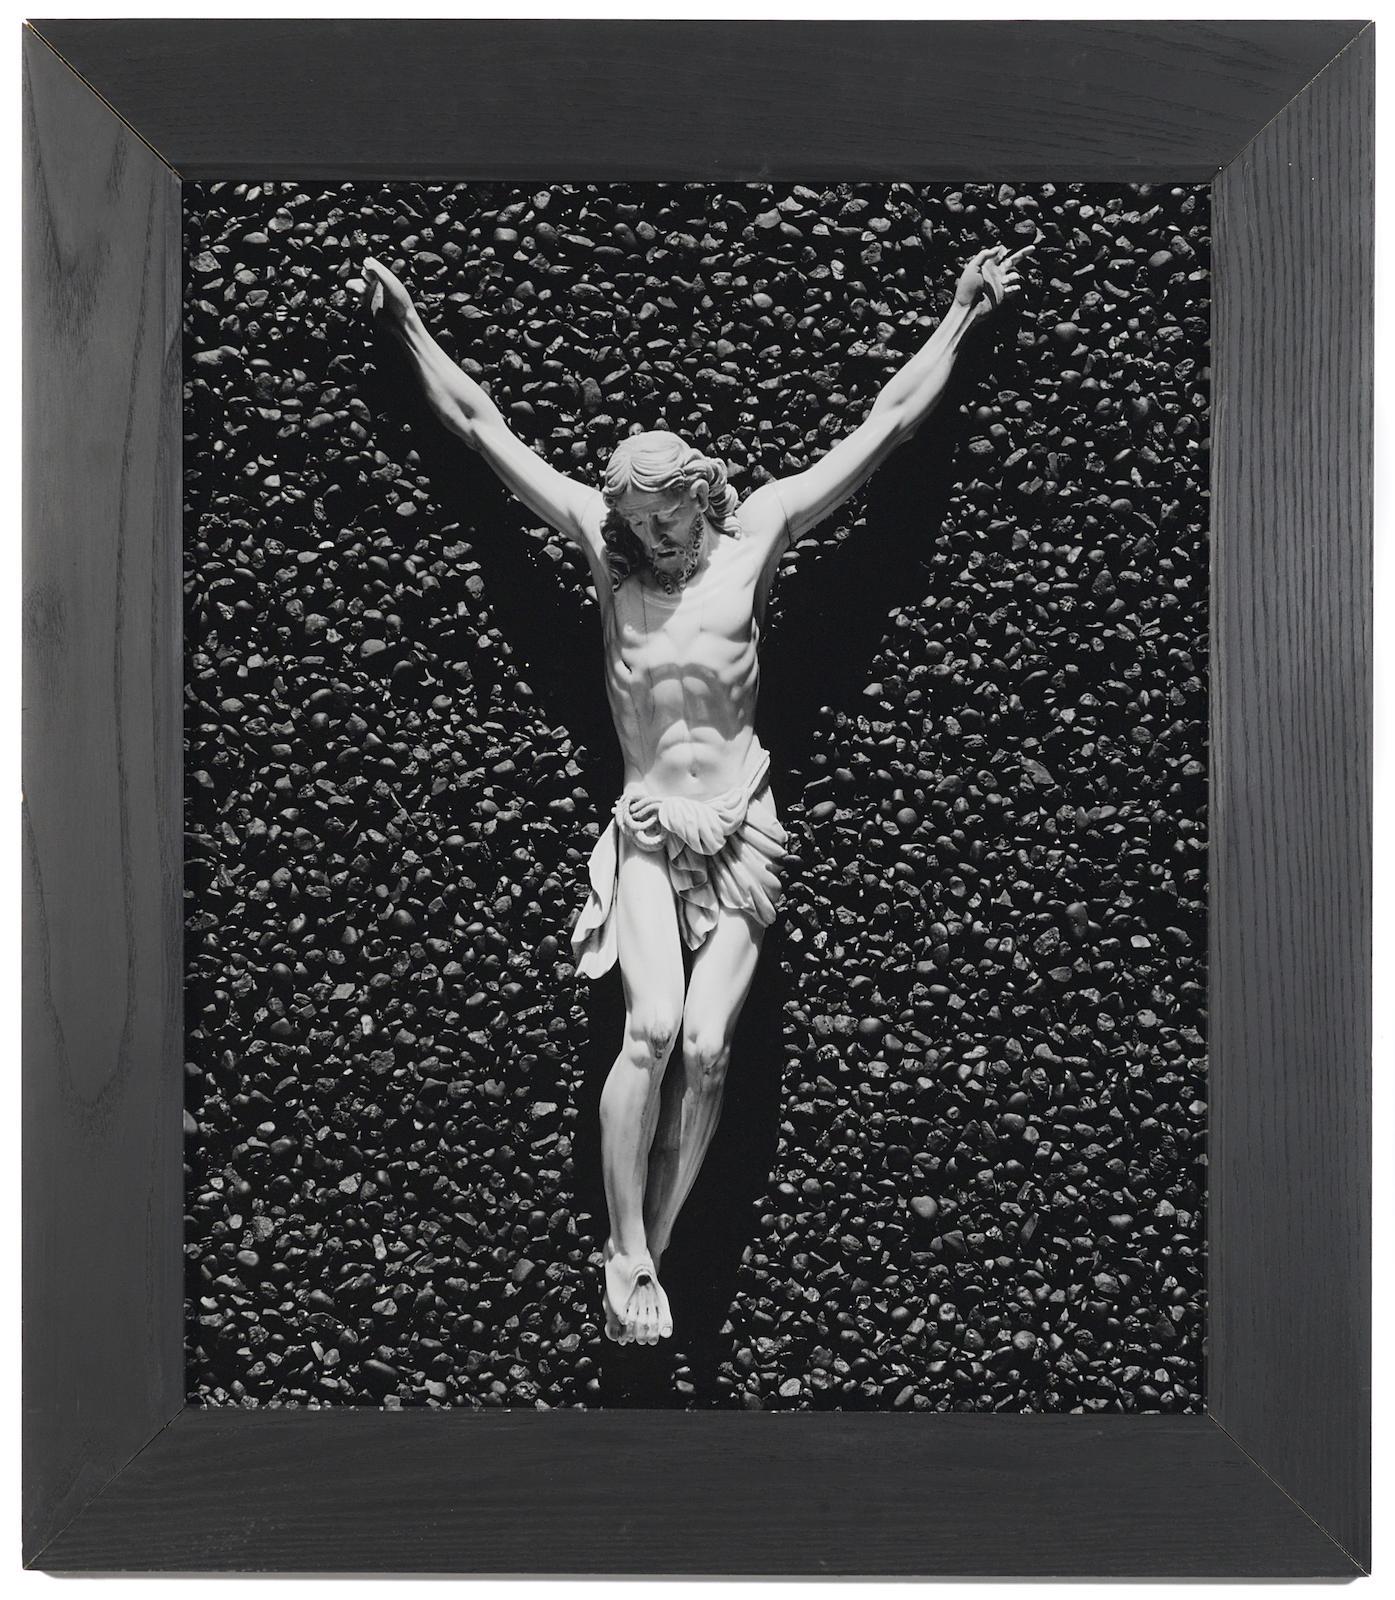 Robert Mapplethorpe-Christ-1988